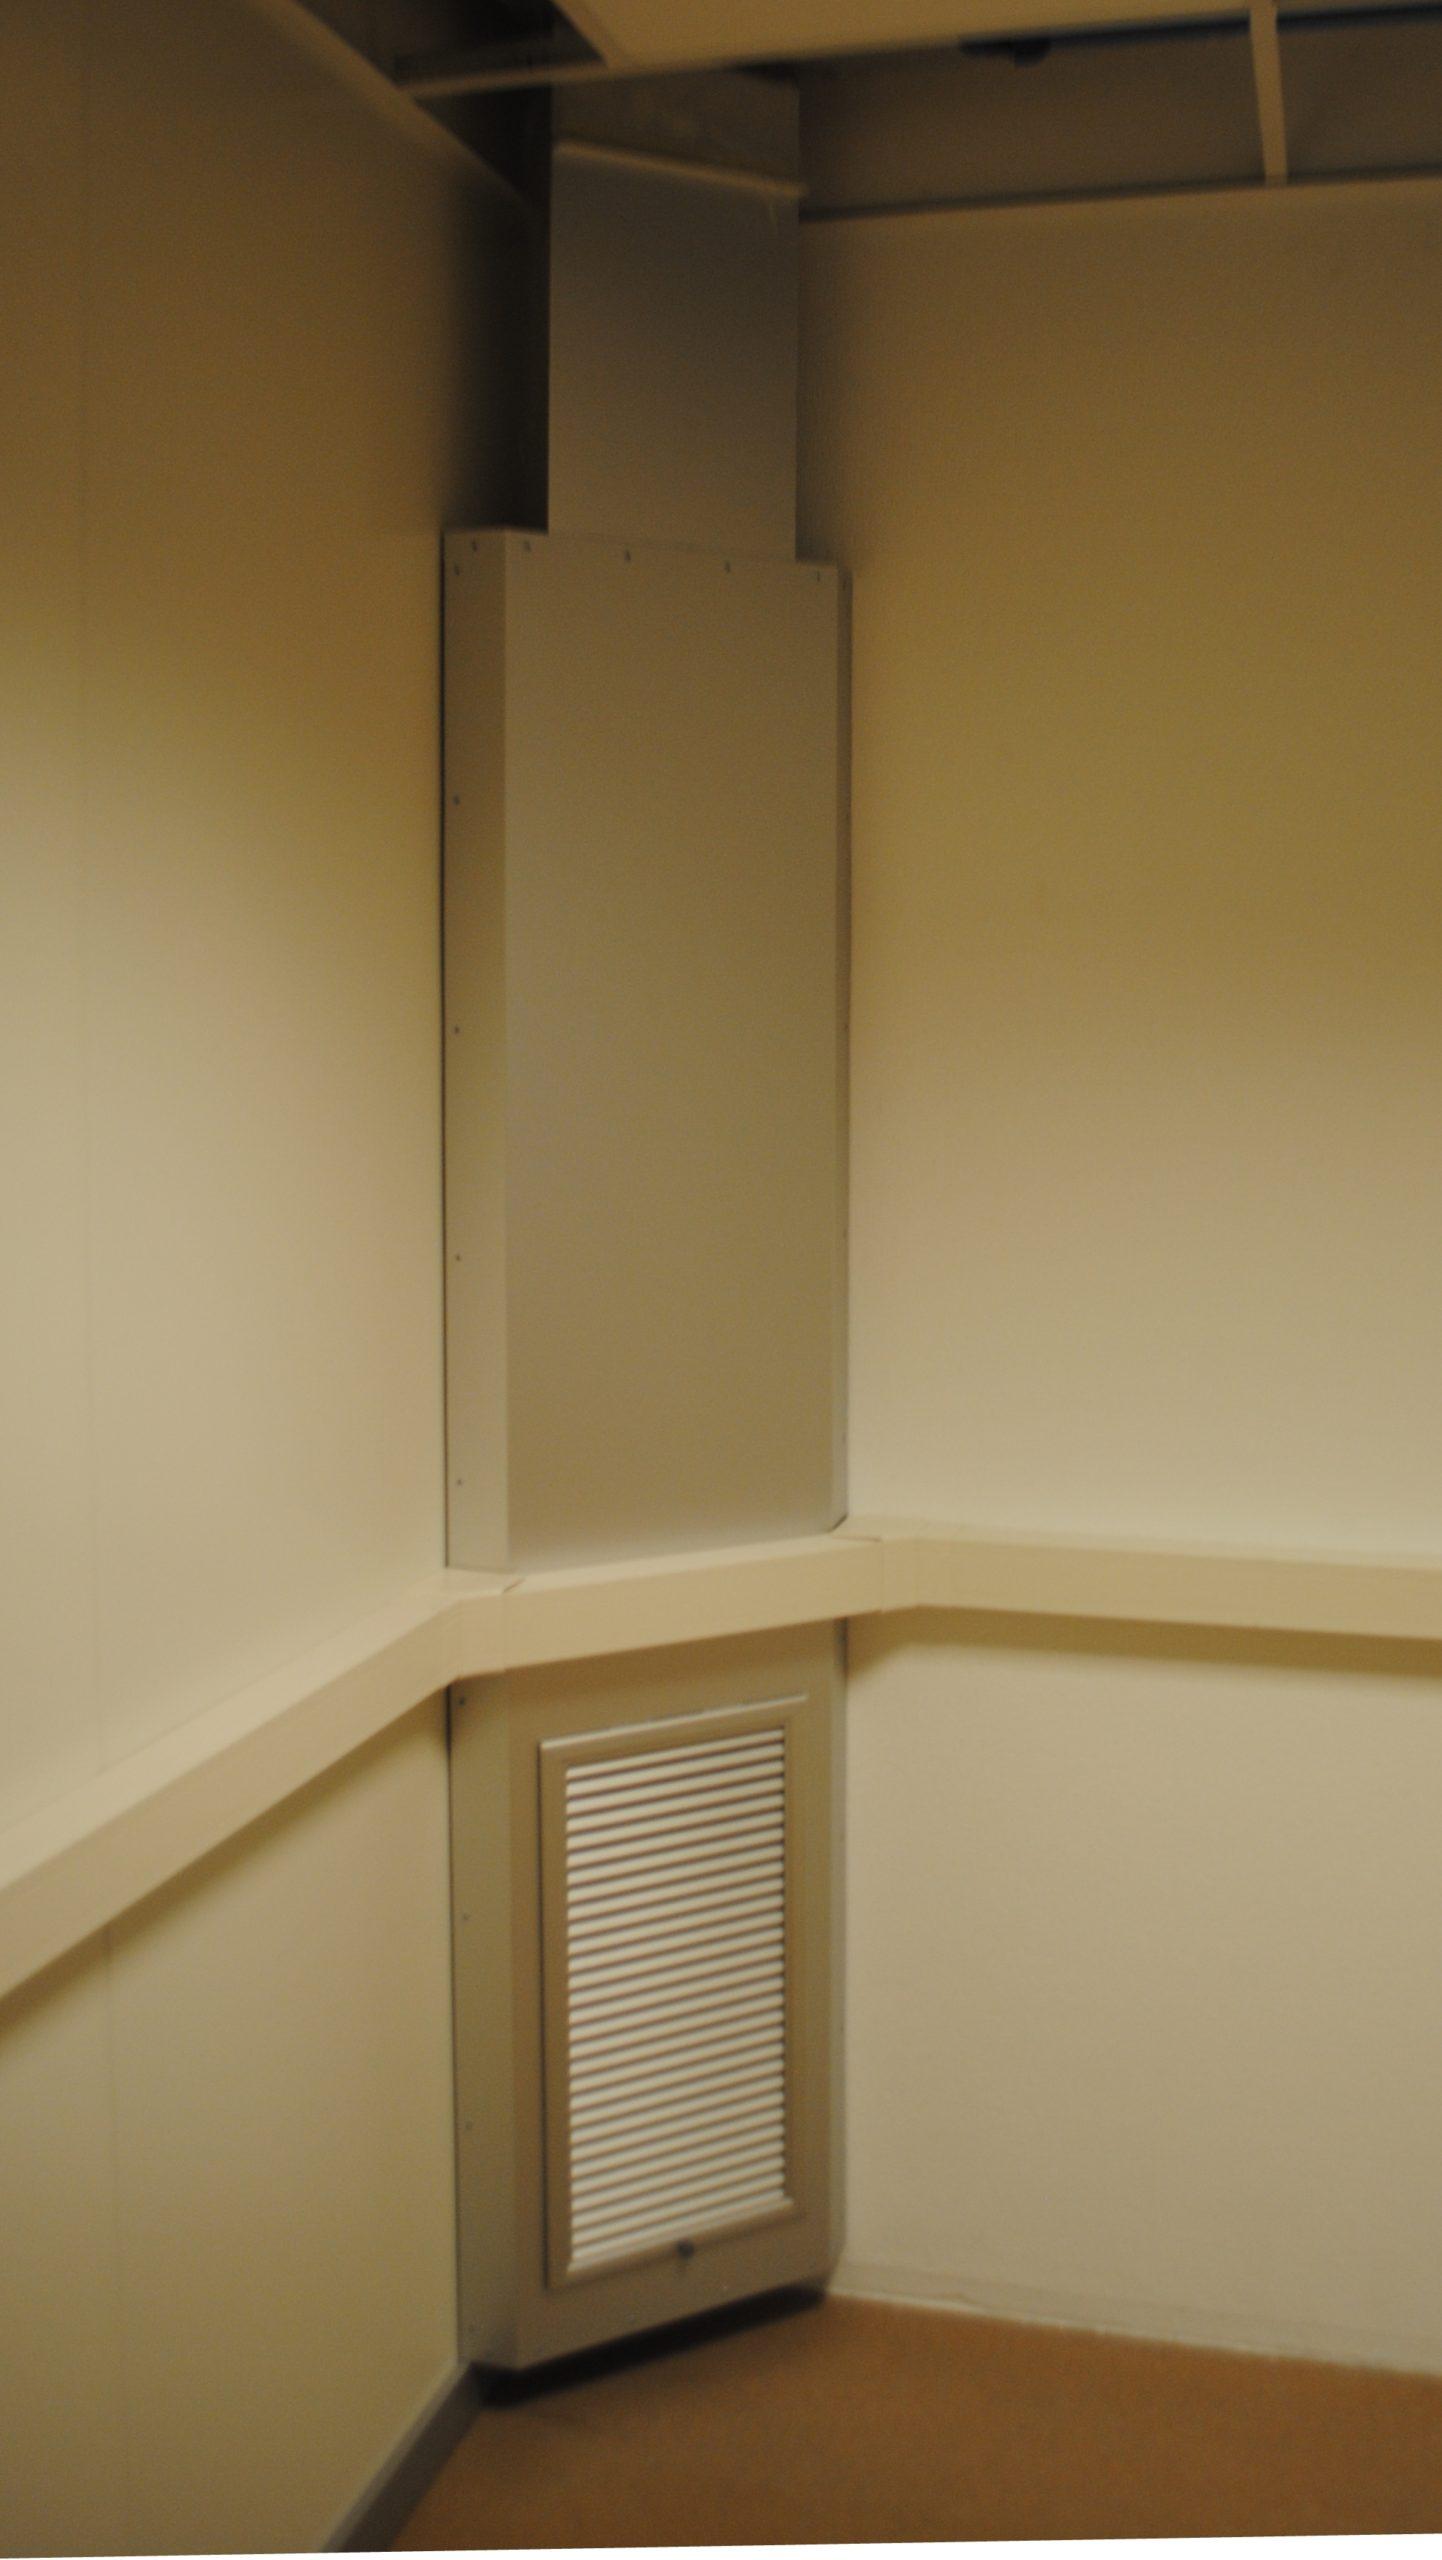 modybox_cmm_climatized_cells_cabine_climatizzate_moden_0079